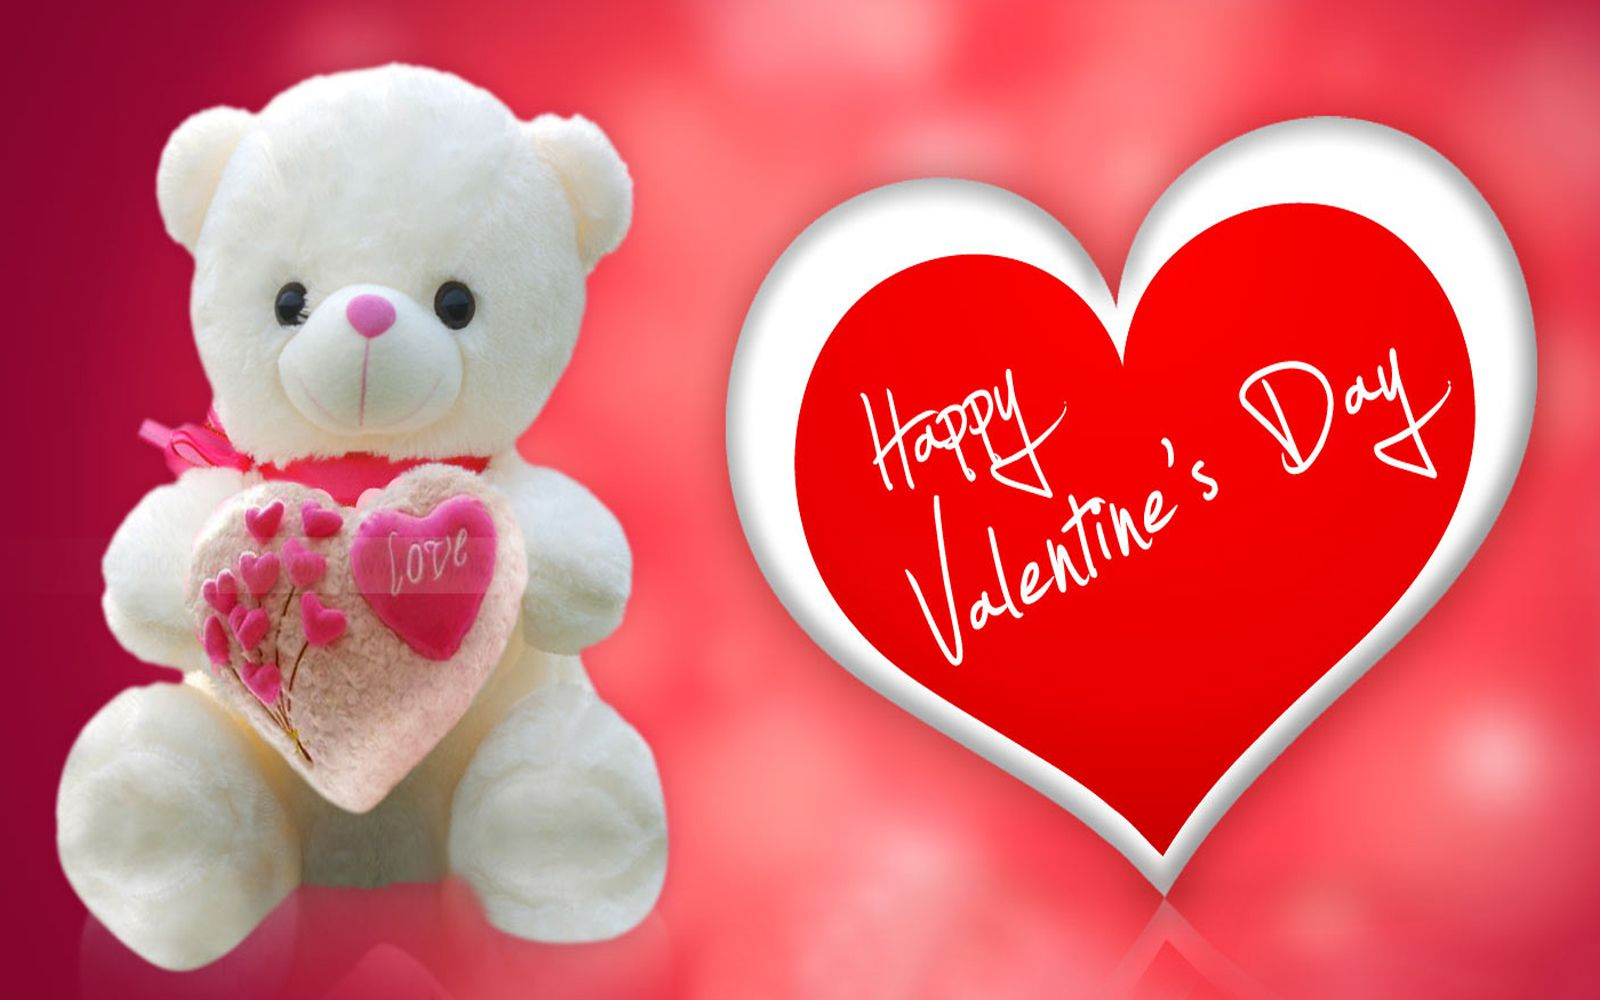 valentines day hd pics 1 | valentines day hd pics | pinterest